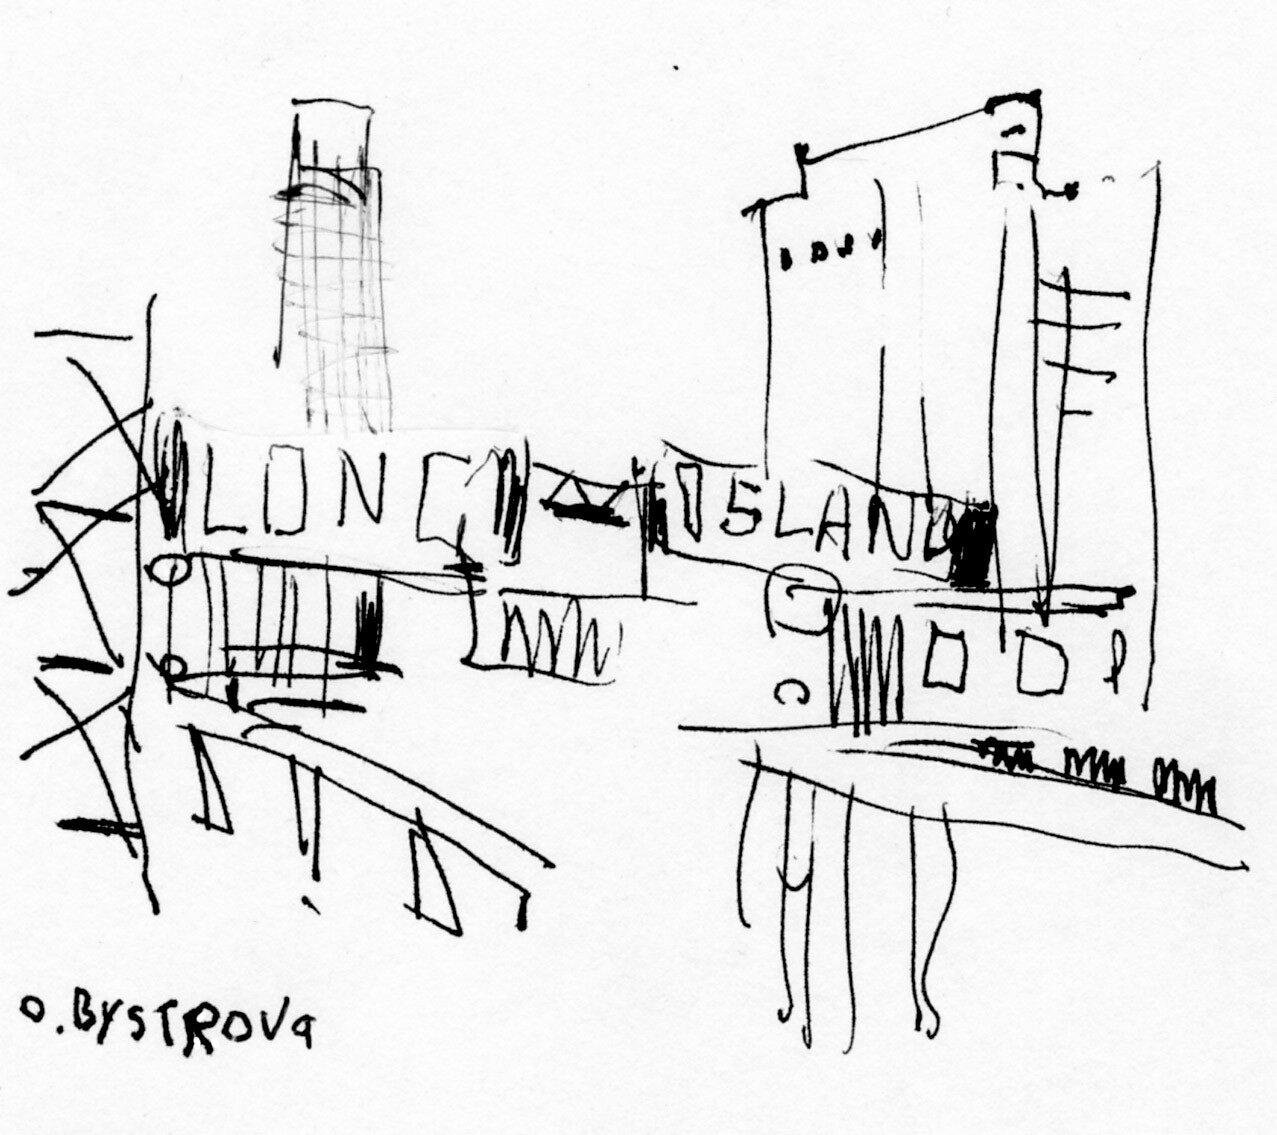 LongIsland_pen